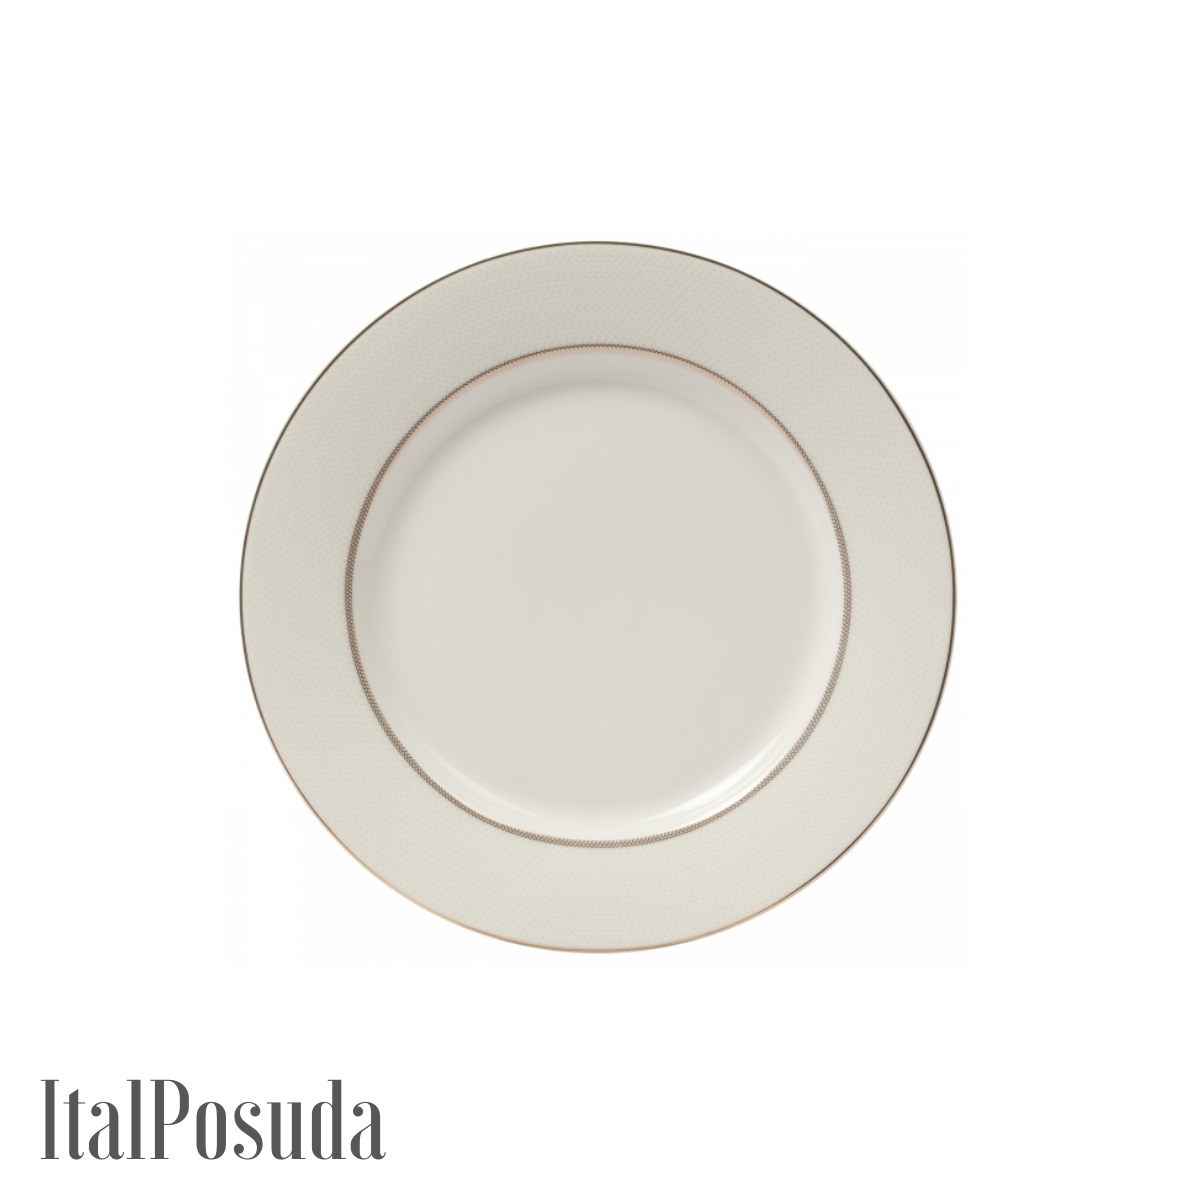 Тарелка обеденная 19 см